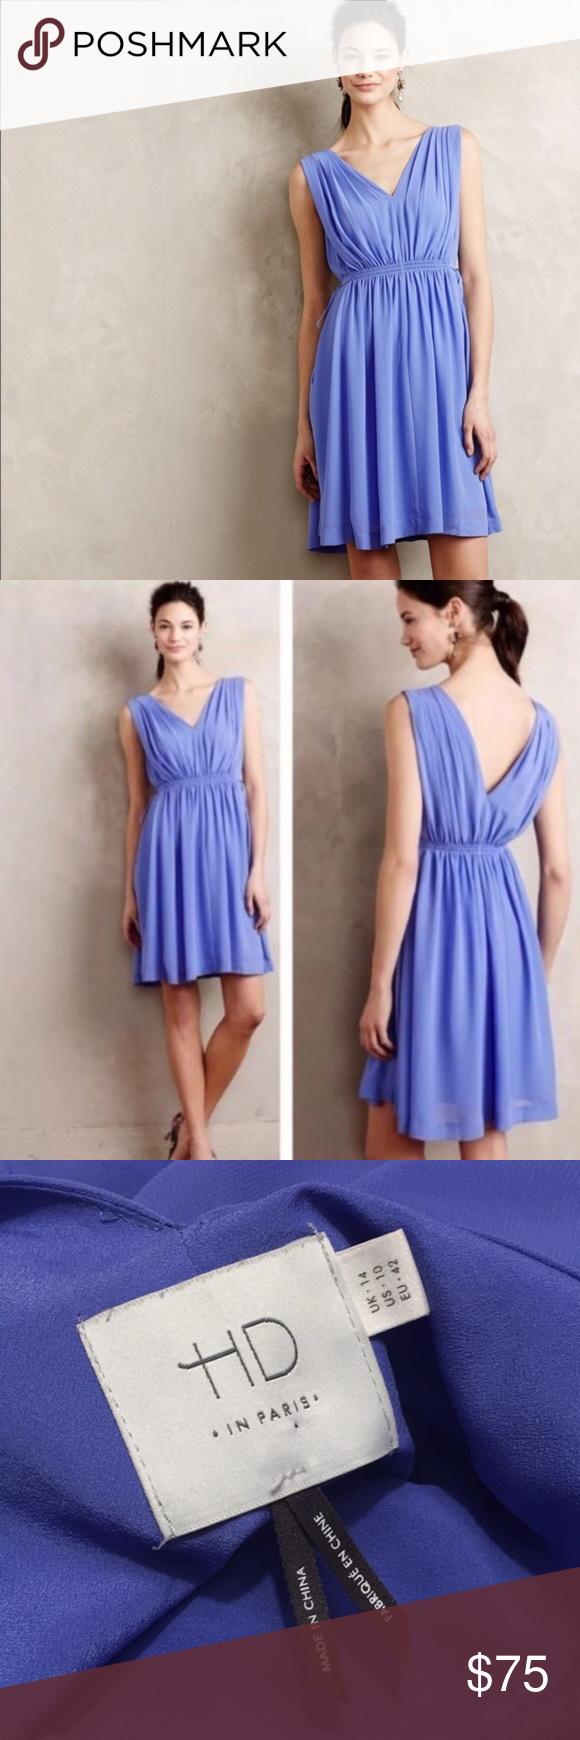 Anthro HD in Paris Grecian Dress | Lavender dresses, Lavender color ...